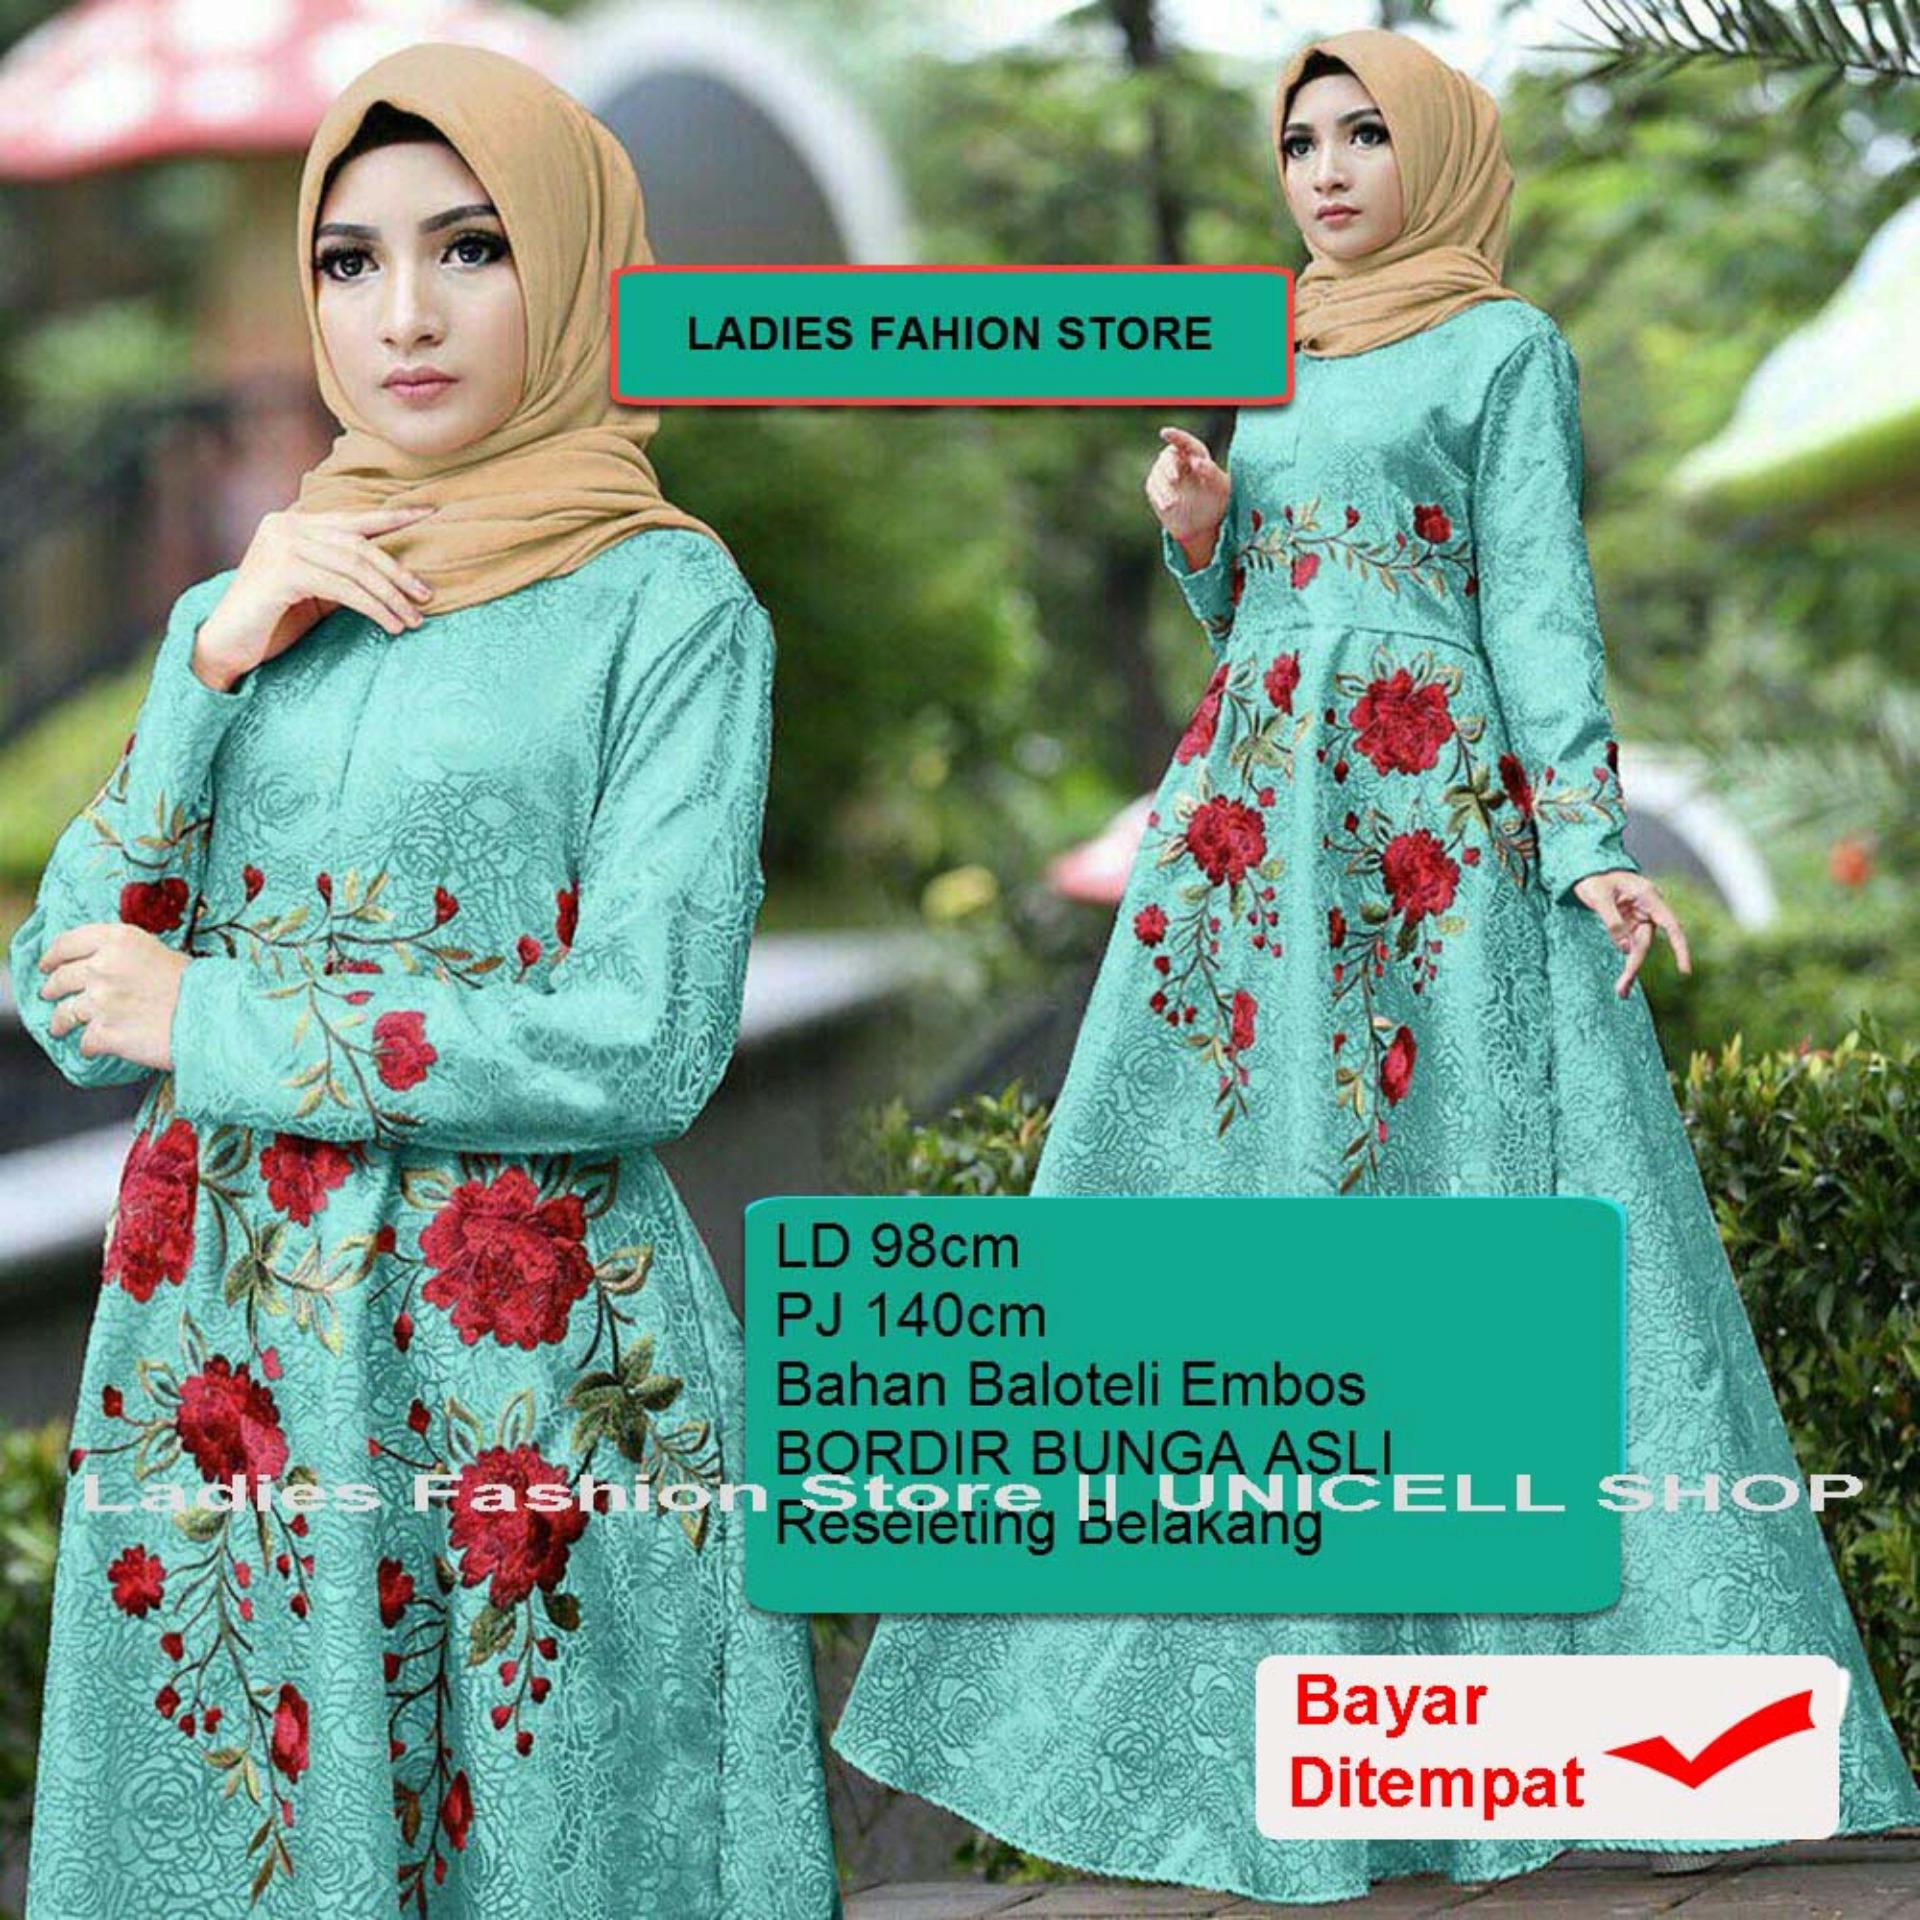 UC Dress Baju Gamis Muslim Iyana/ Set Terusan Maxi Hijab Syar'i/ Syari Simple Elegant / Baju Muslimah Wanita / Kebaya Modern Baloteli Tanpa Pasmina (anaay) SS - Tosca / Gaun Pesta